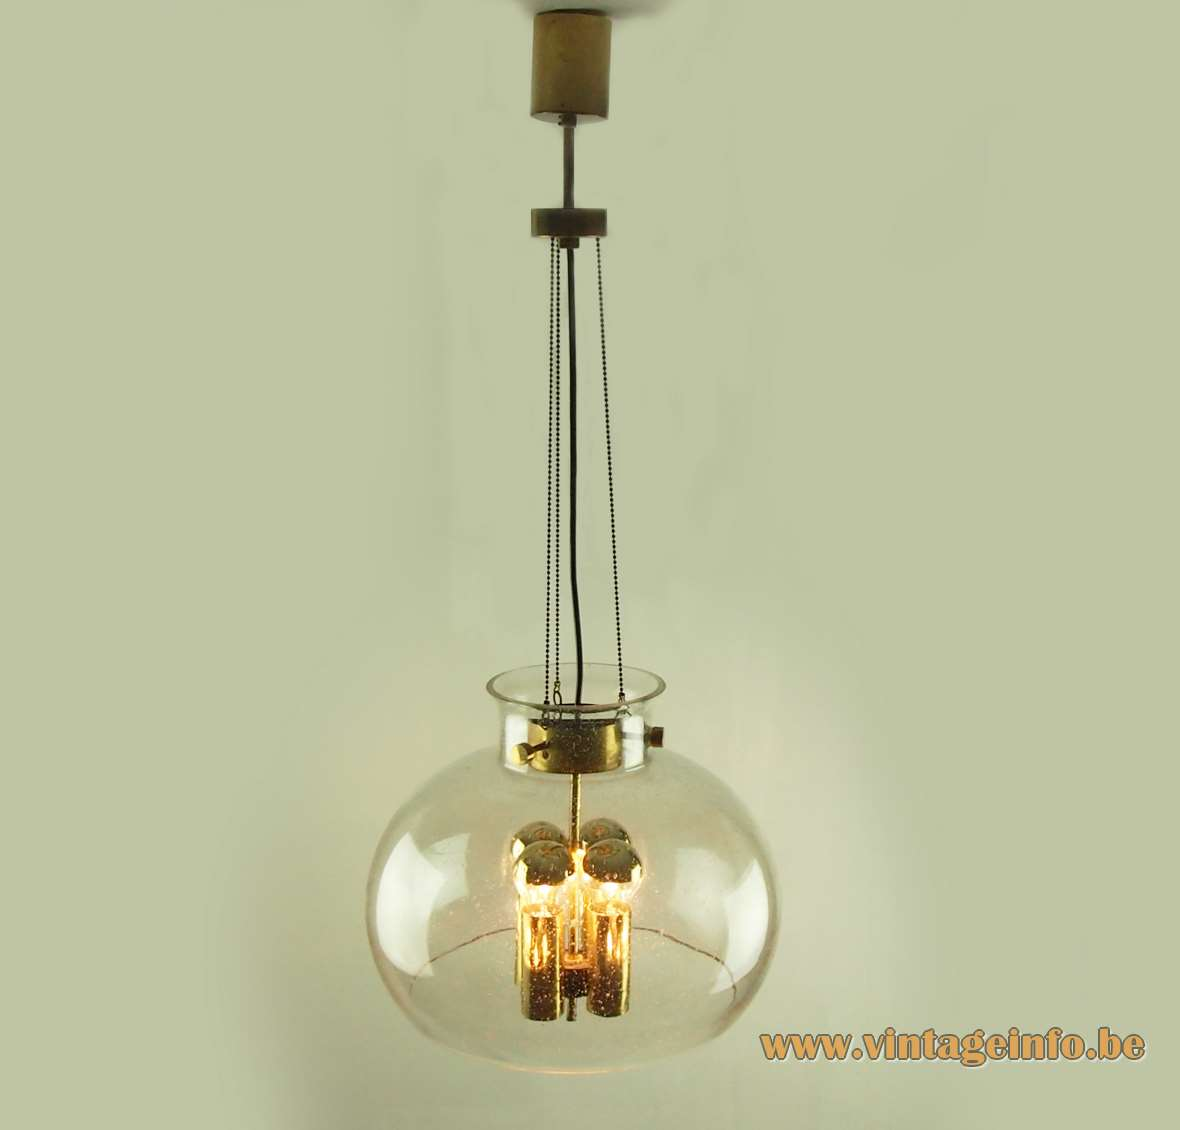 Herbert Proft Glashütte Limburg chandelier clear glass globe 4 brass tubes rods & chains 1970s Germany